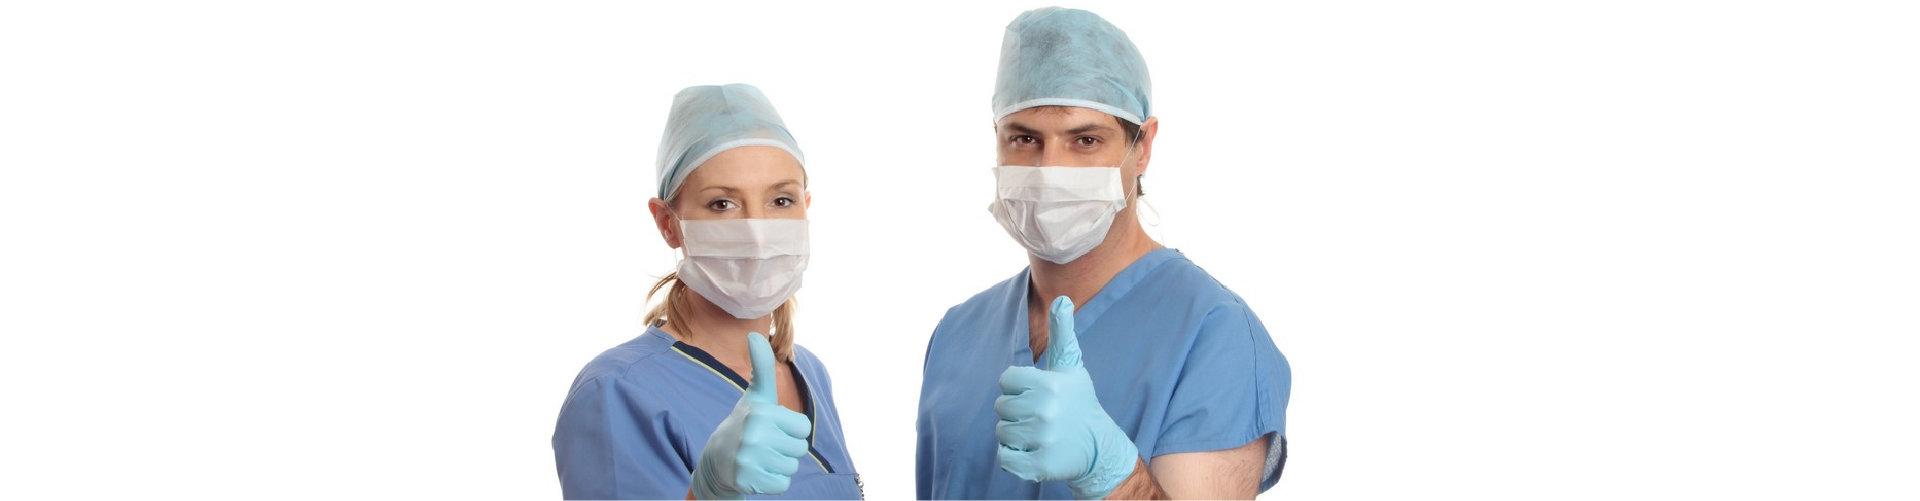 healtcare workers wearing mask